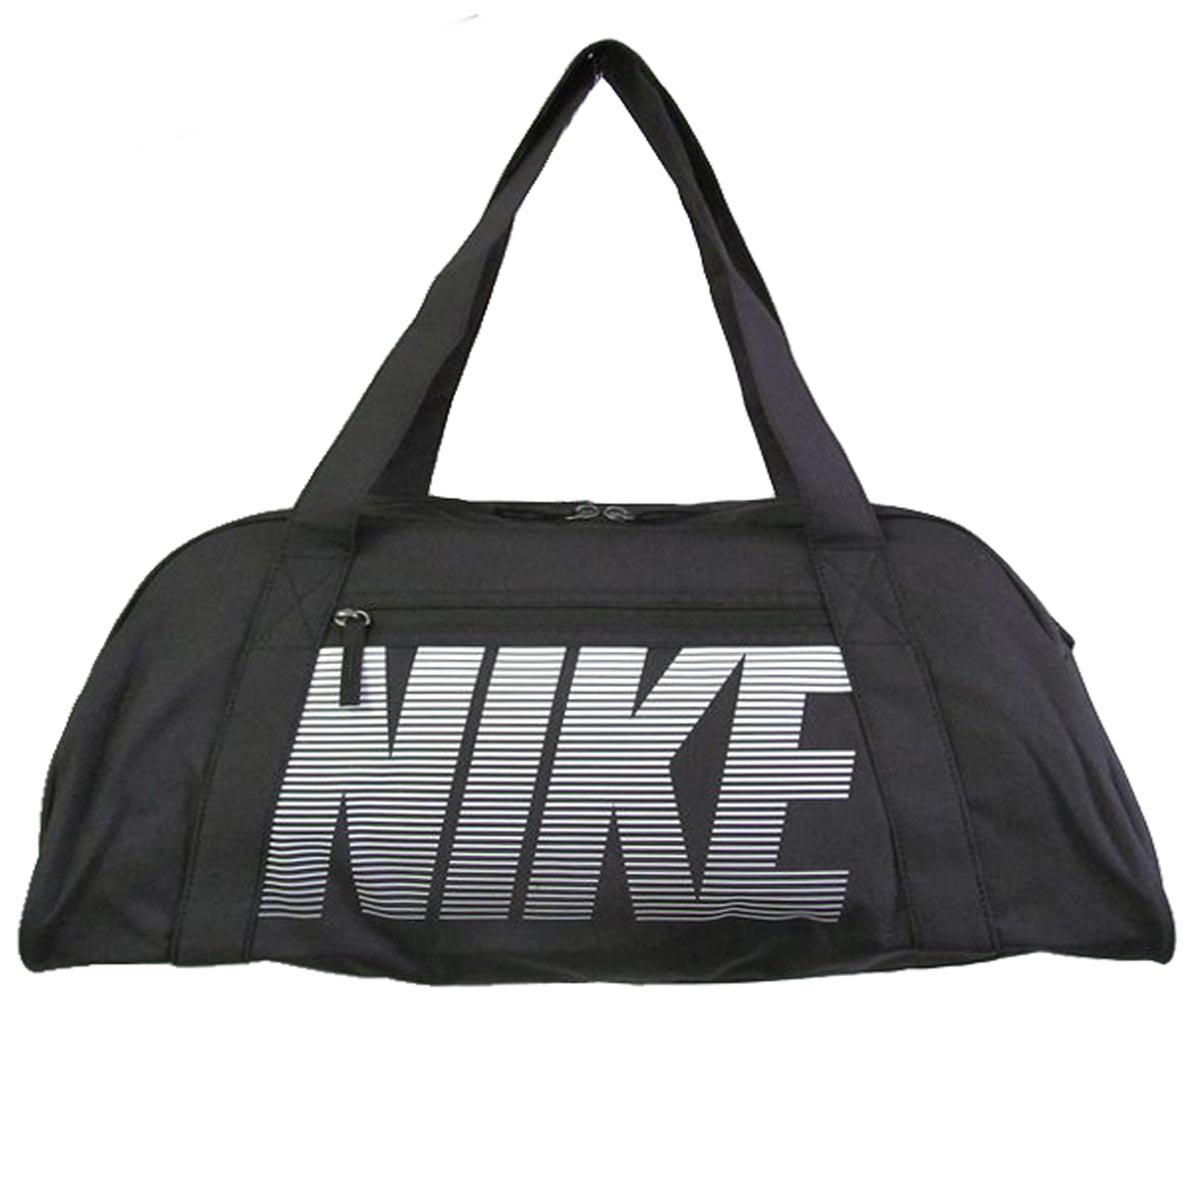 be64695e98c8 Nike Gym Club Duffle Bag (Dark Grey)